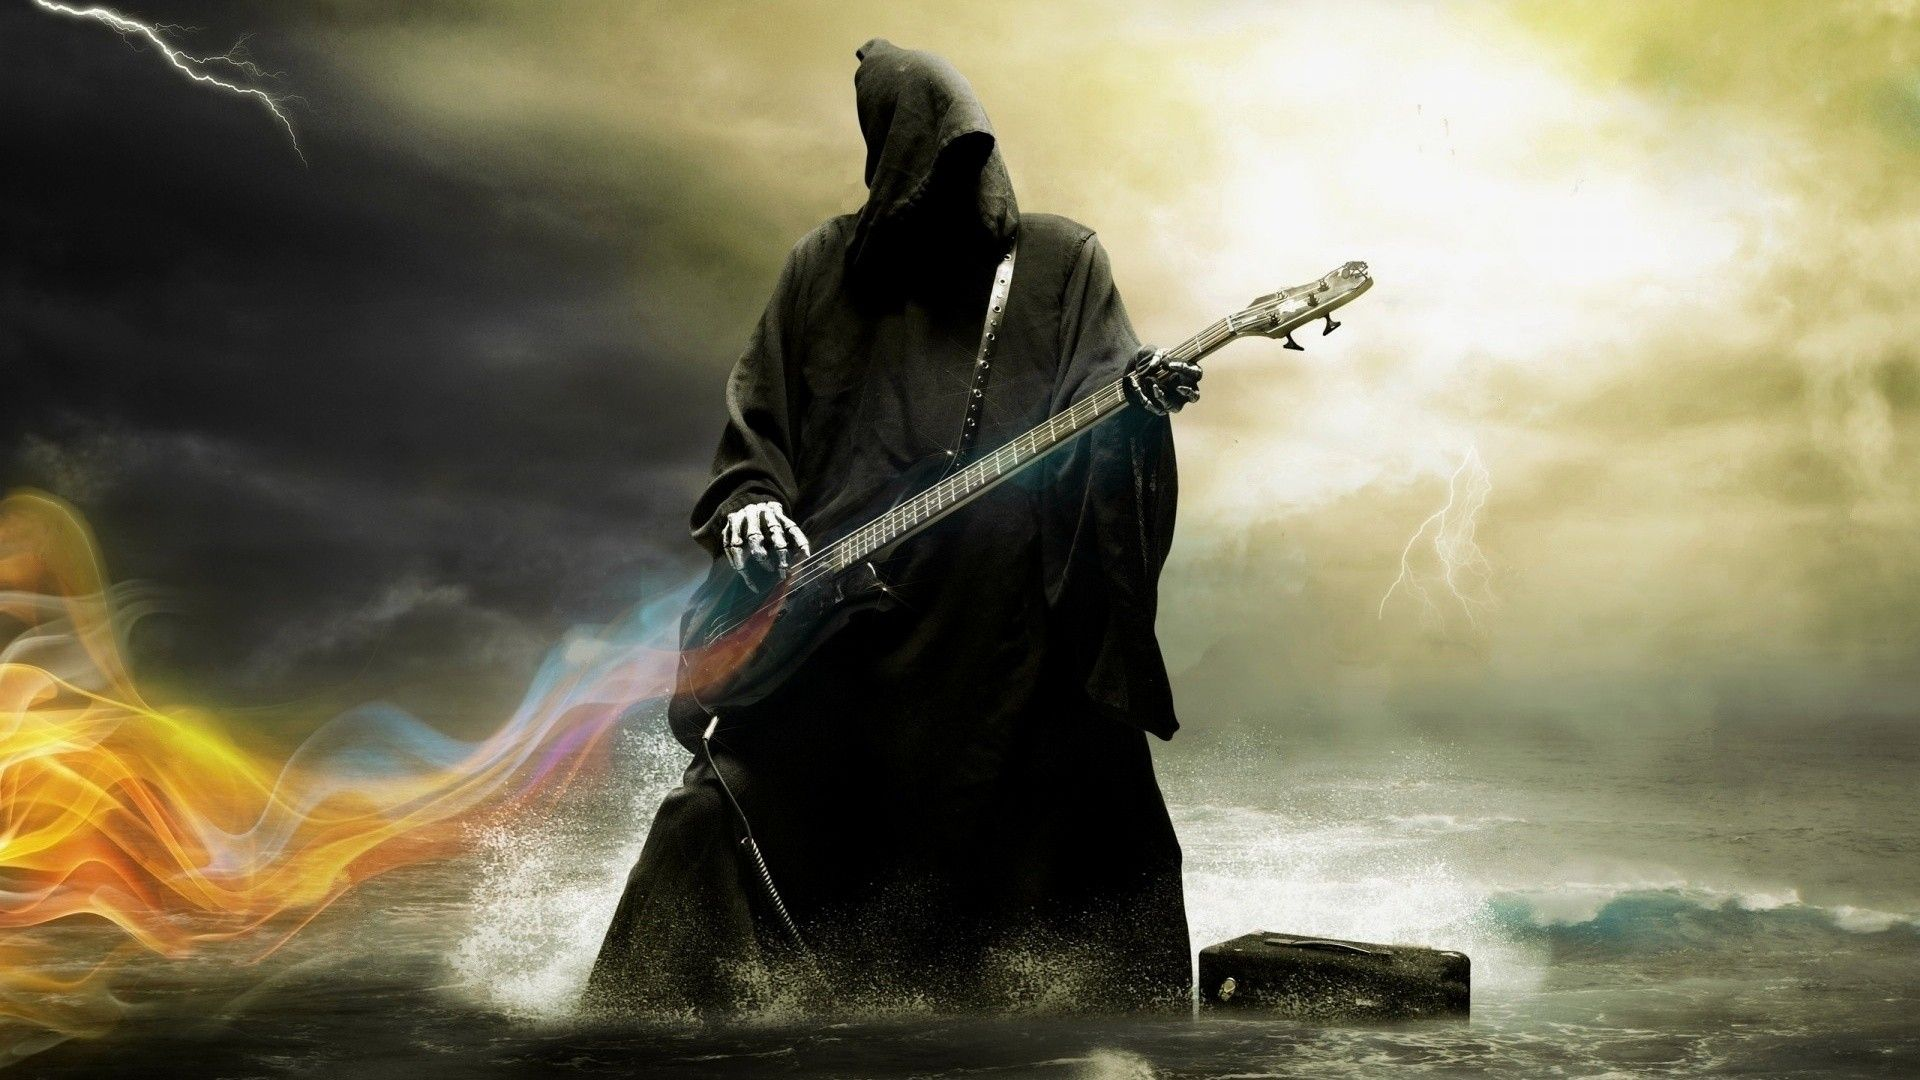 4K Grim Reaper Wallpapers - Top Free 4K Grim Reaper Backgrounds